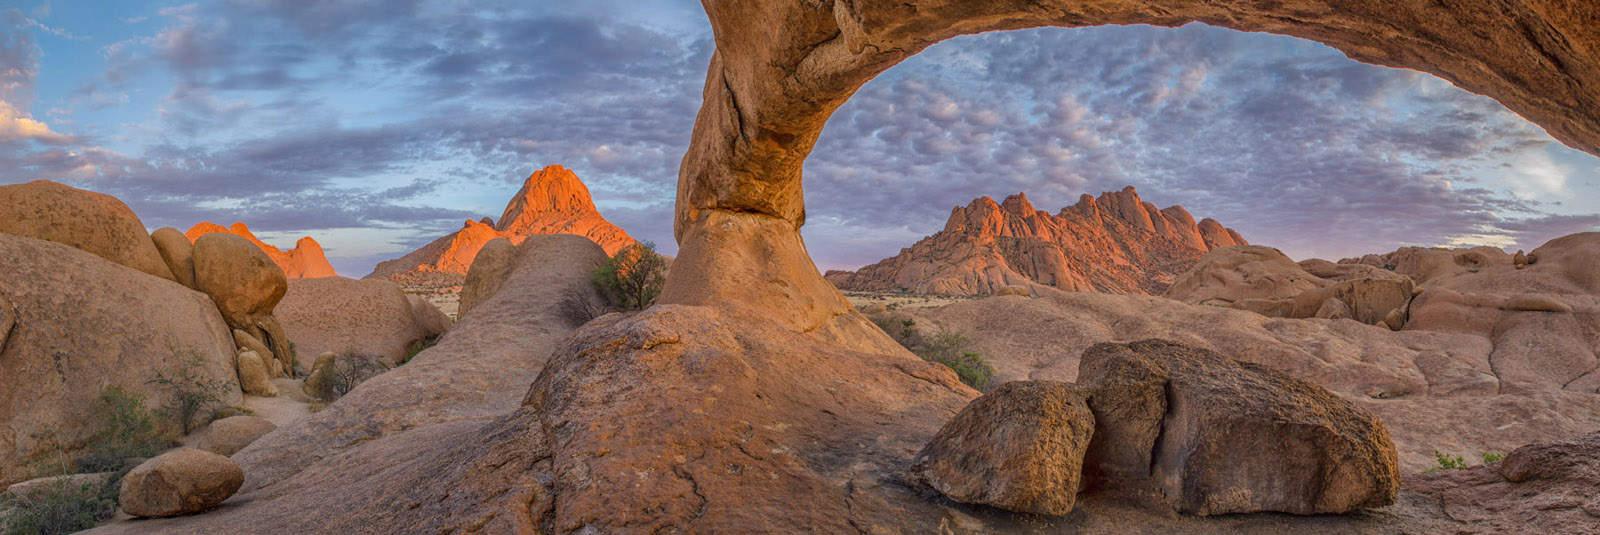 Namibia: Mecca for Landscape Photographers